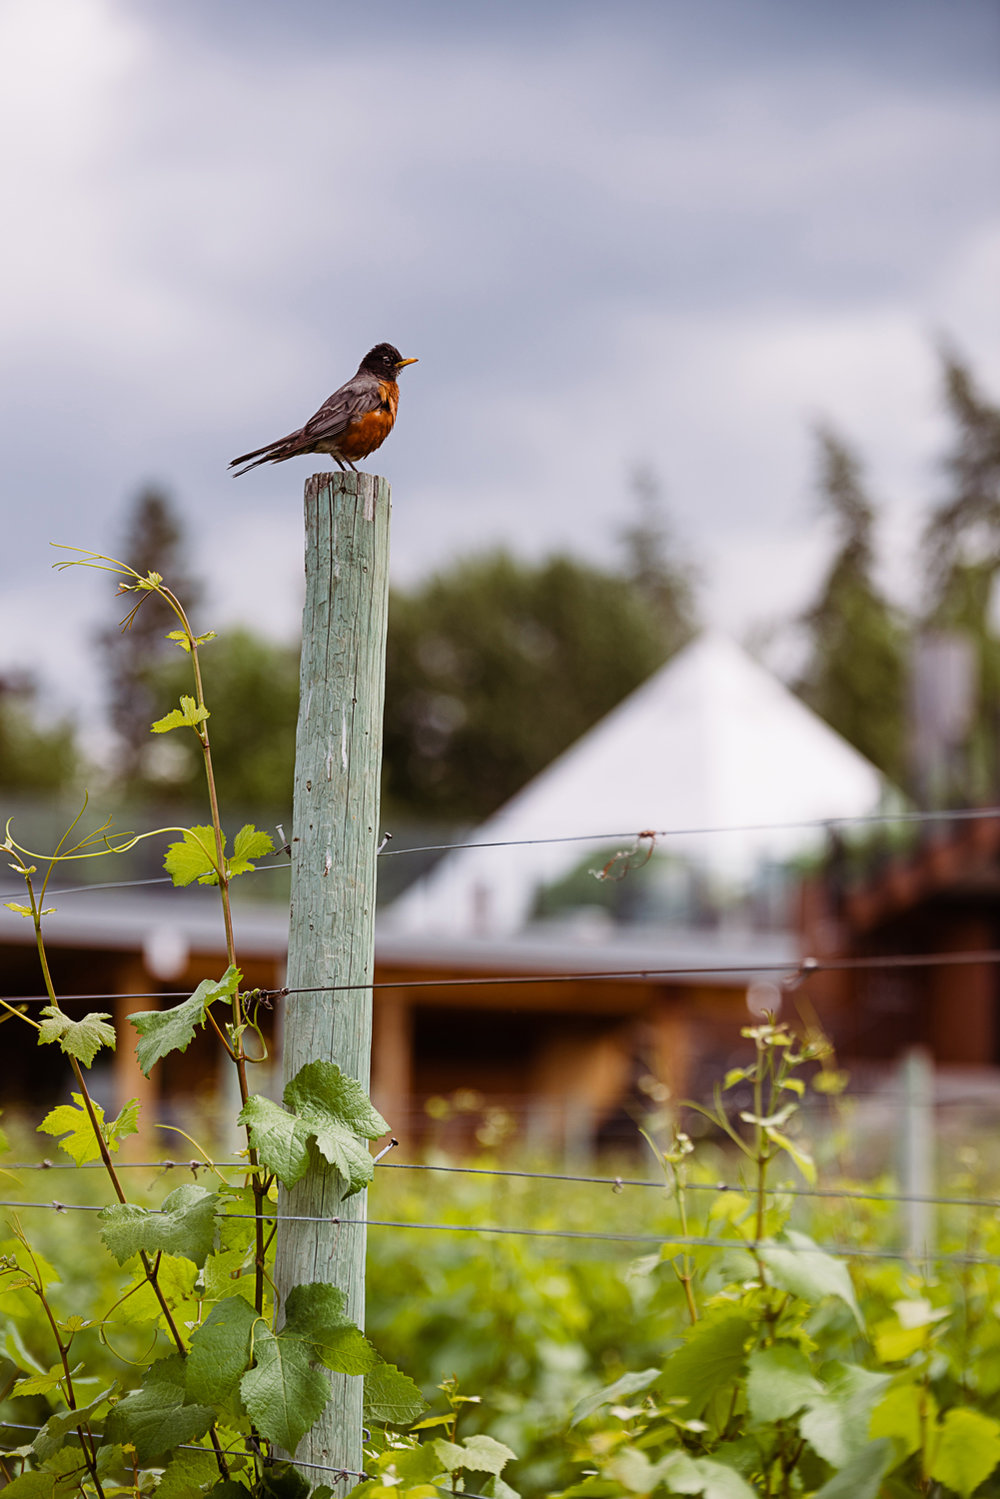 Summerhill Alive Packaging - birds